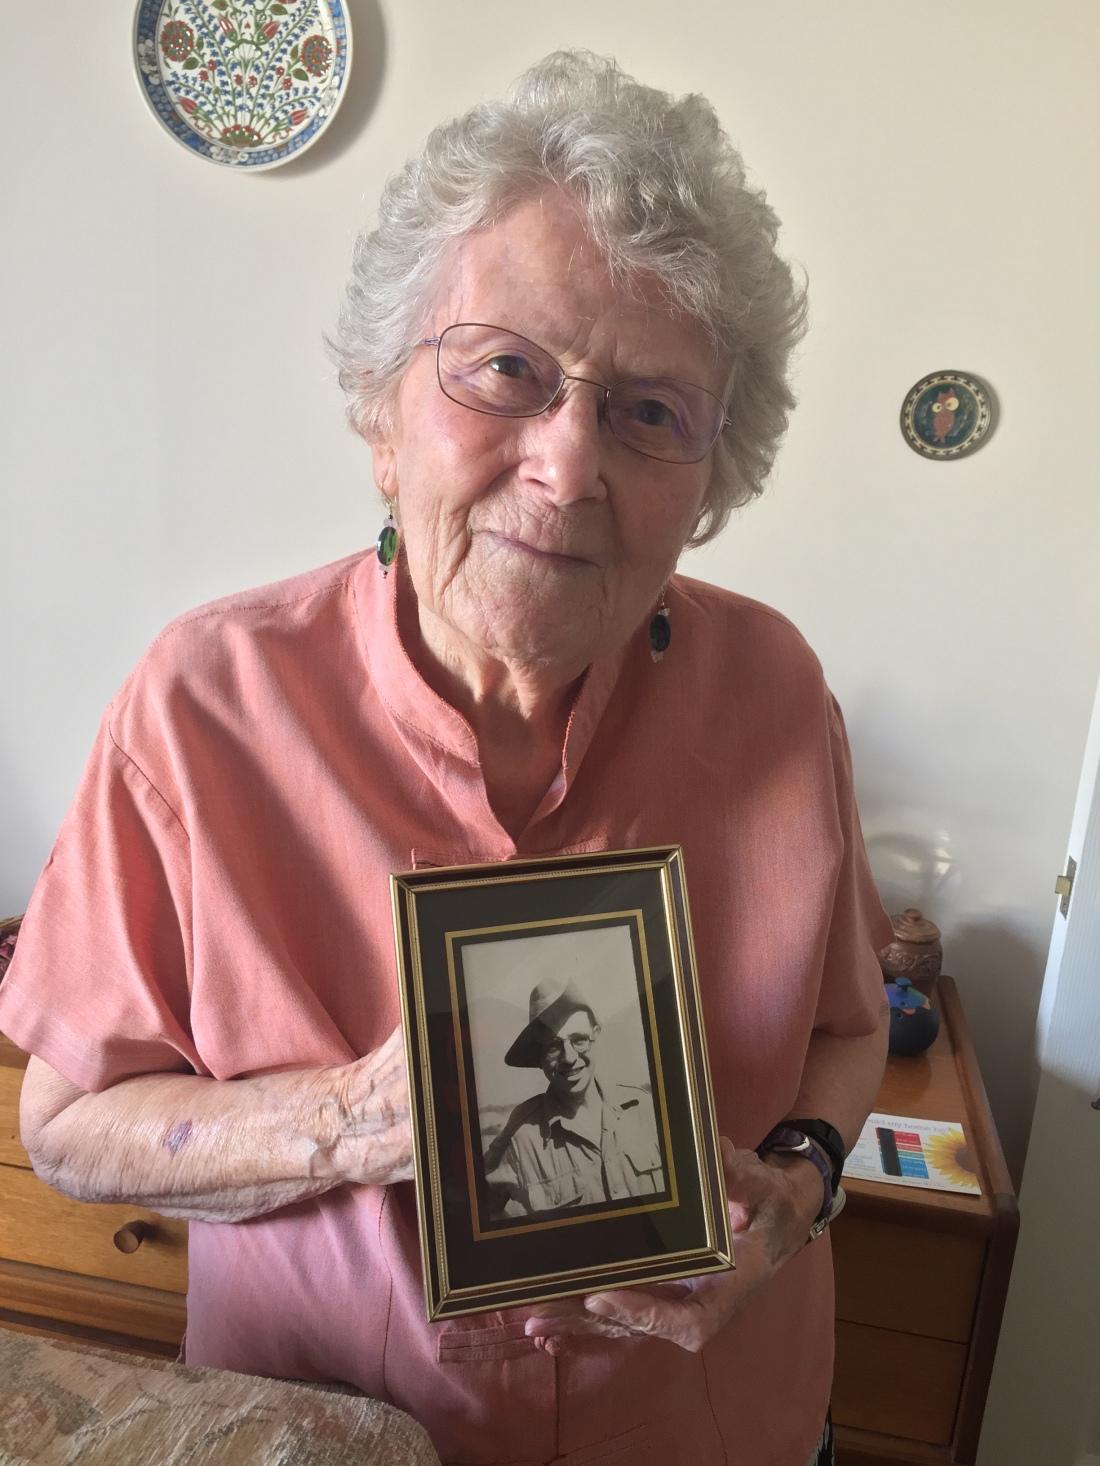 Joan Eggmore with Photograph of Husband (10 April 2017)